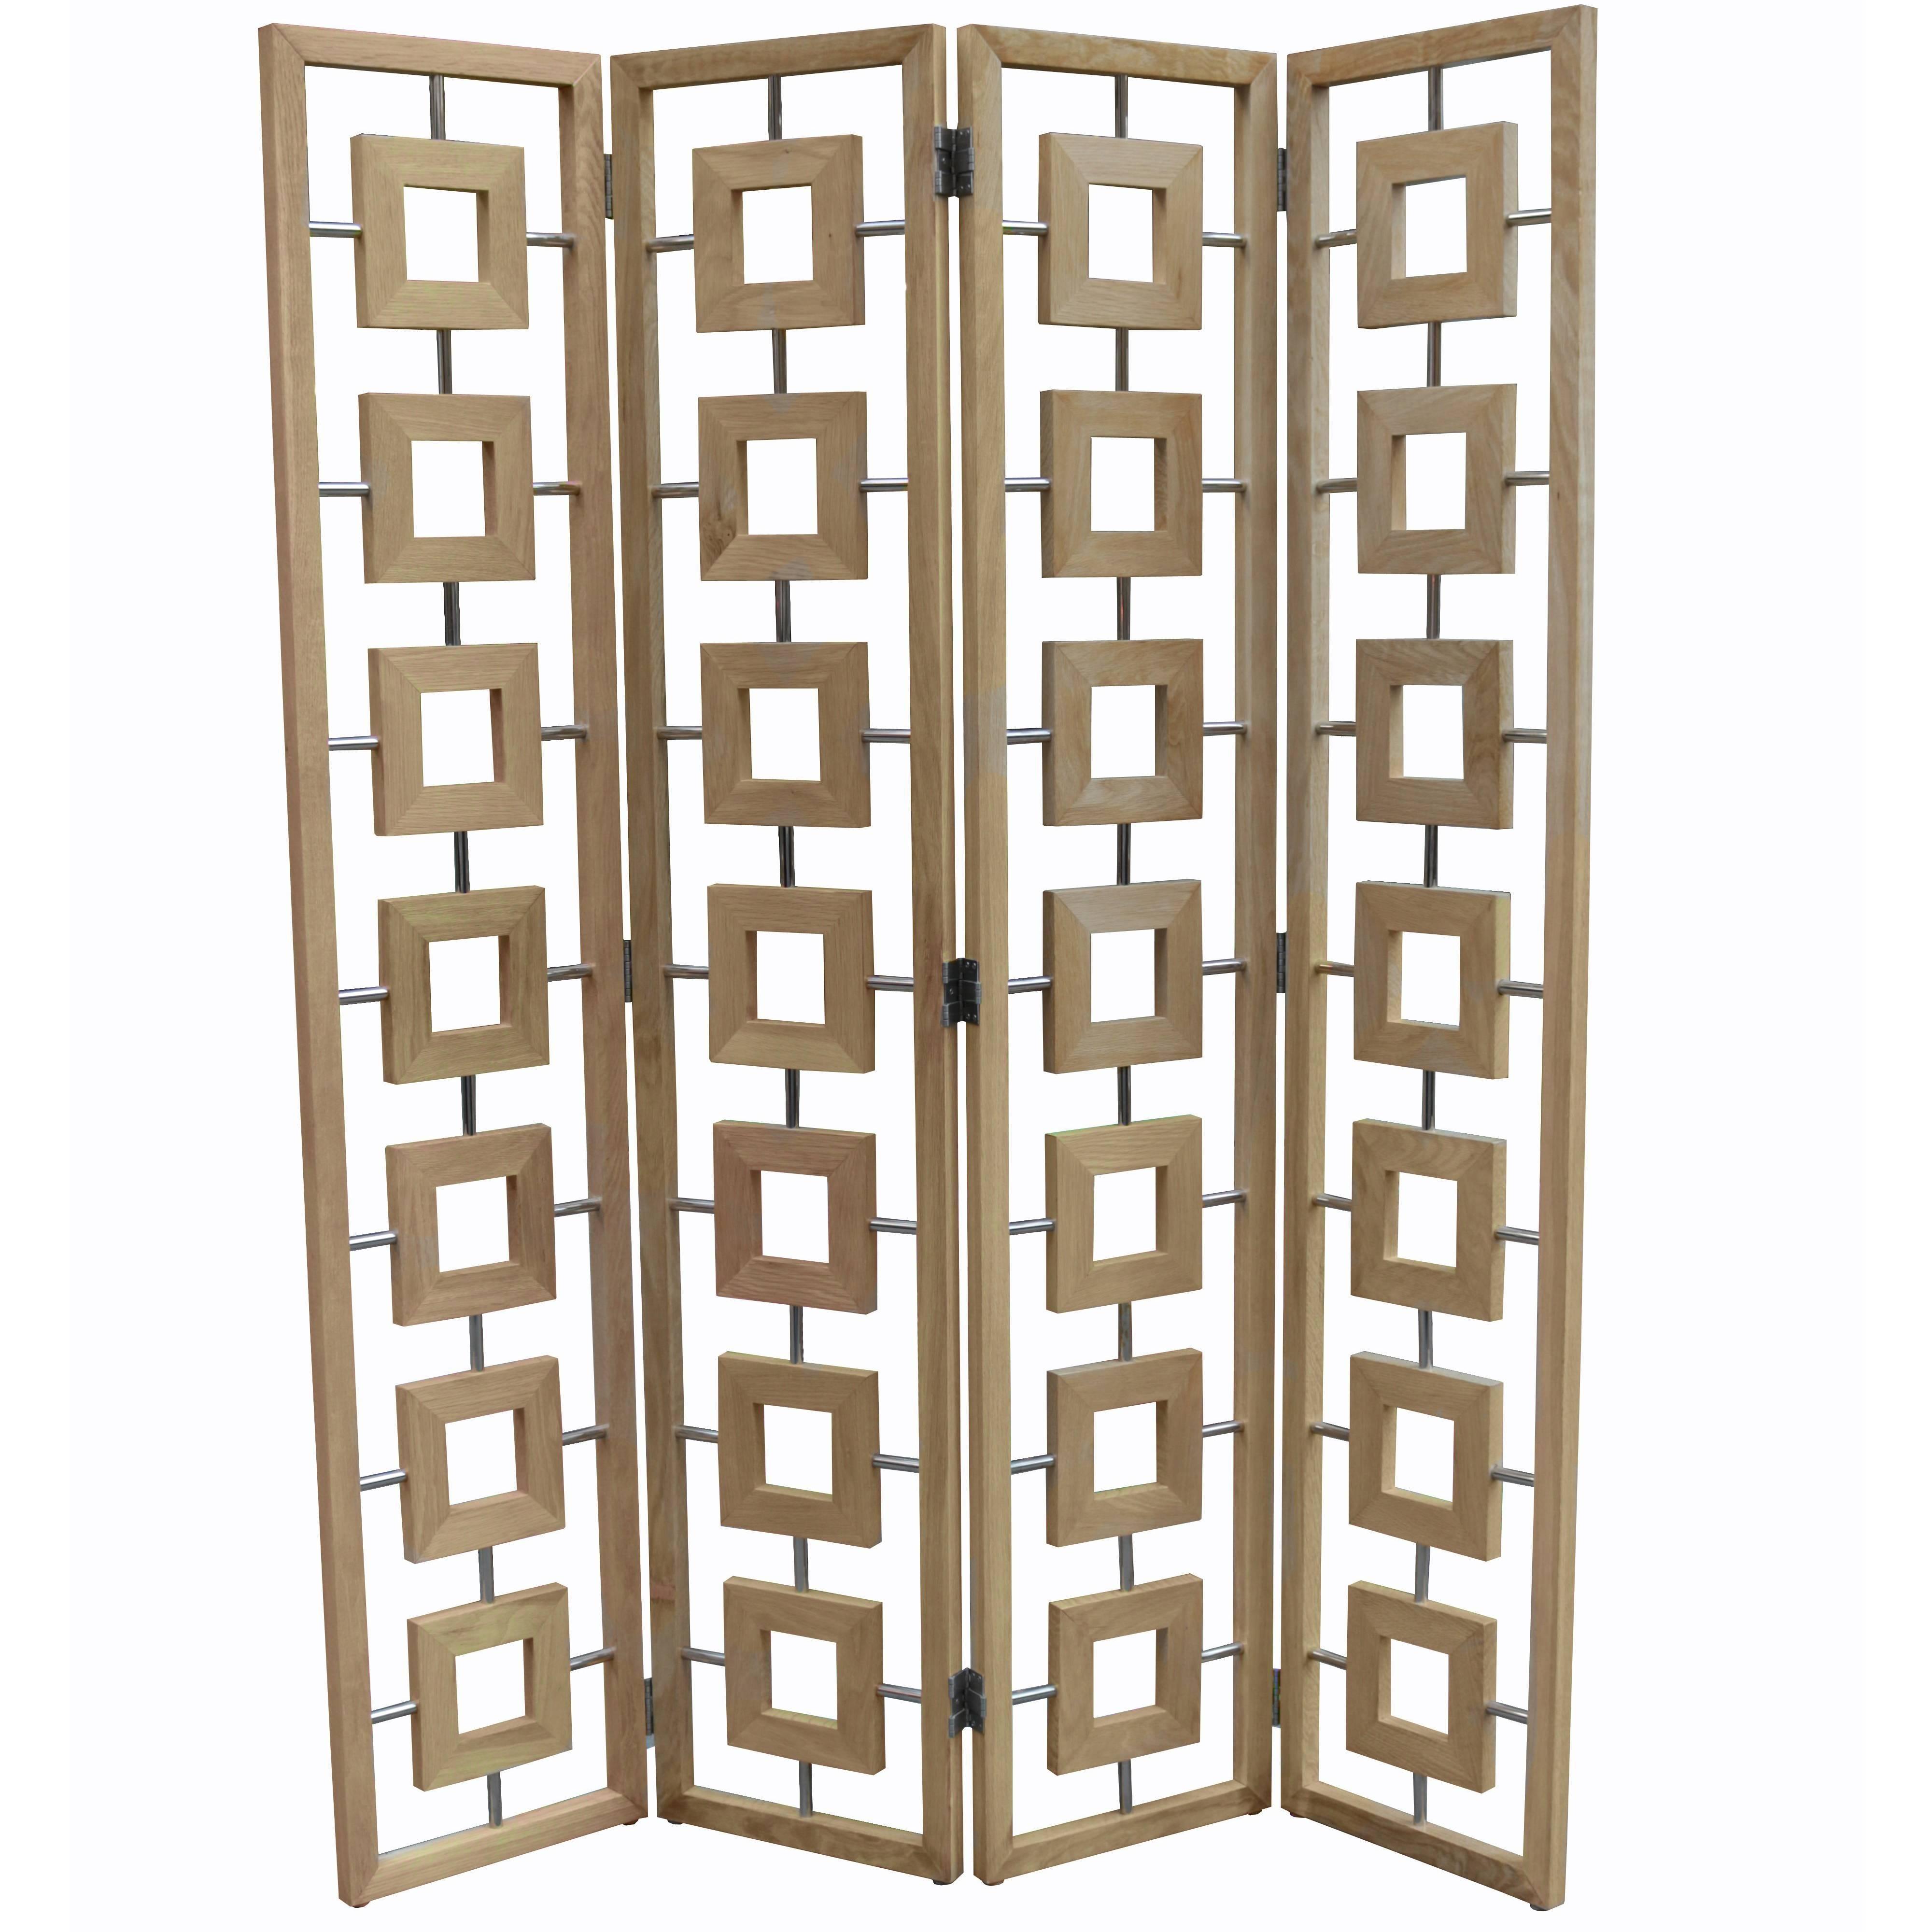 Modernist Four-Panel Folding Screen